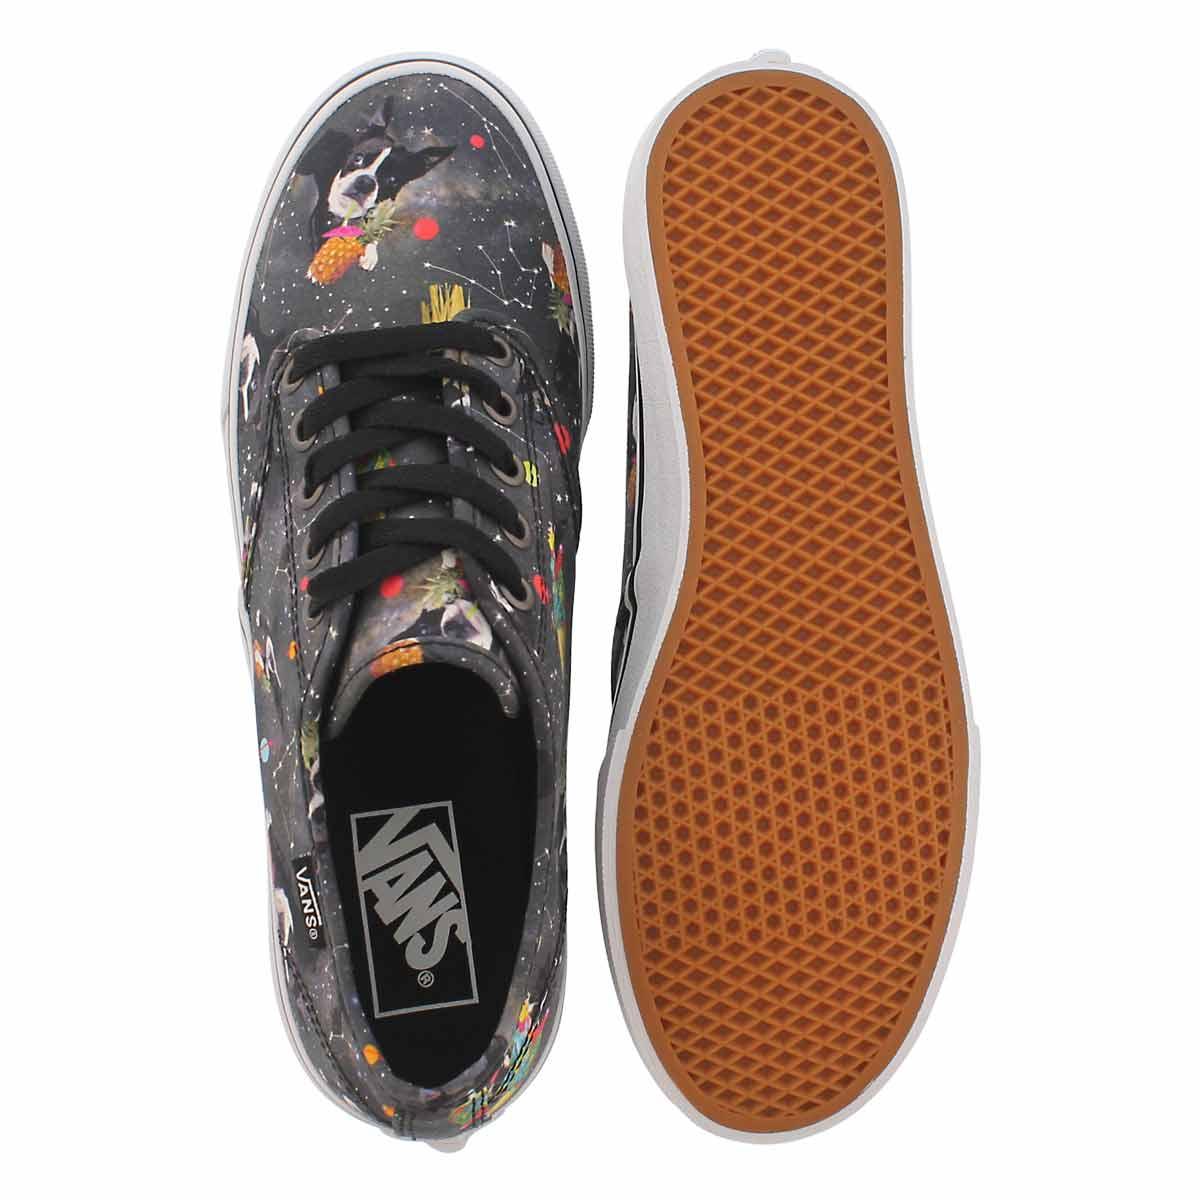 Lds Camden Stripe bk/mlti laceup sneaker